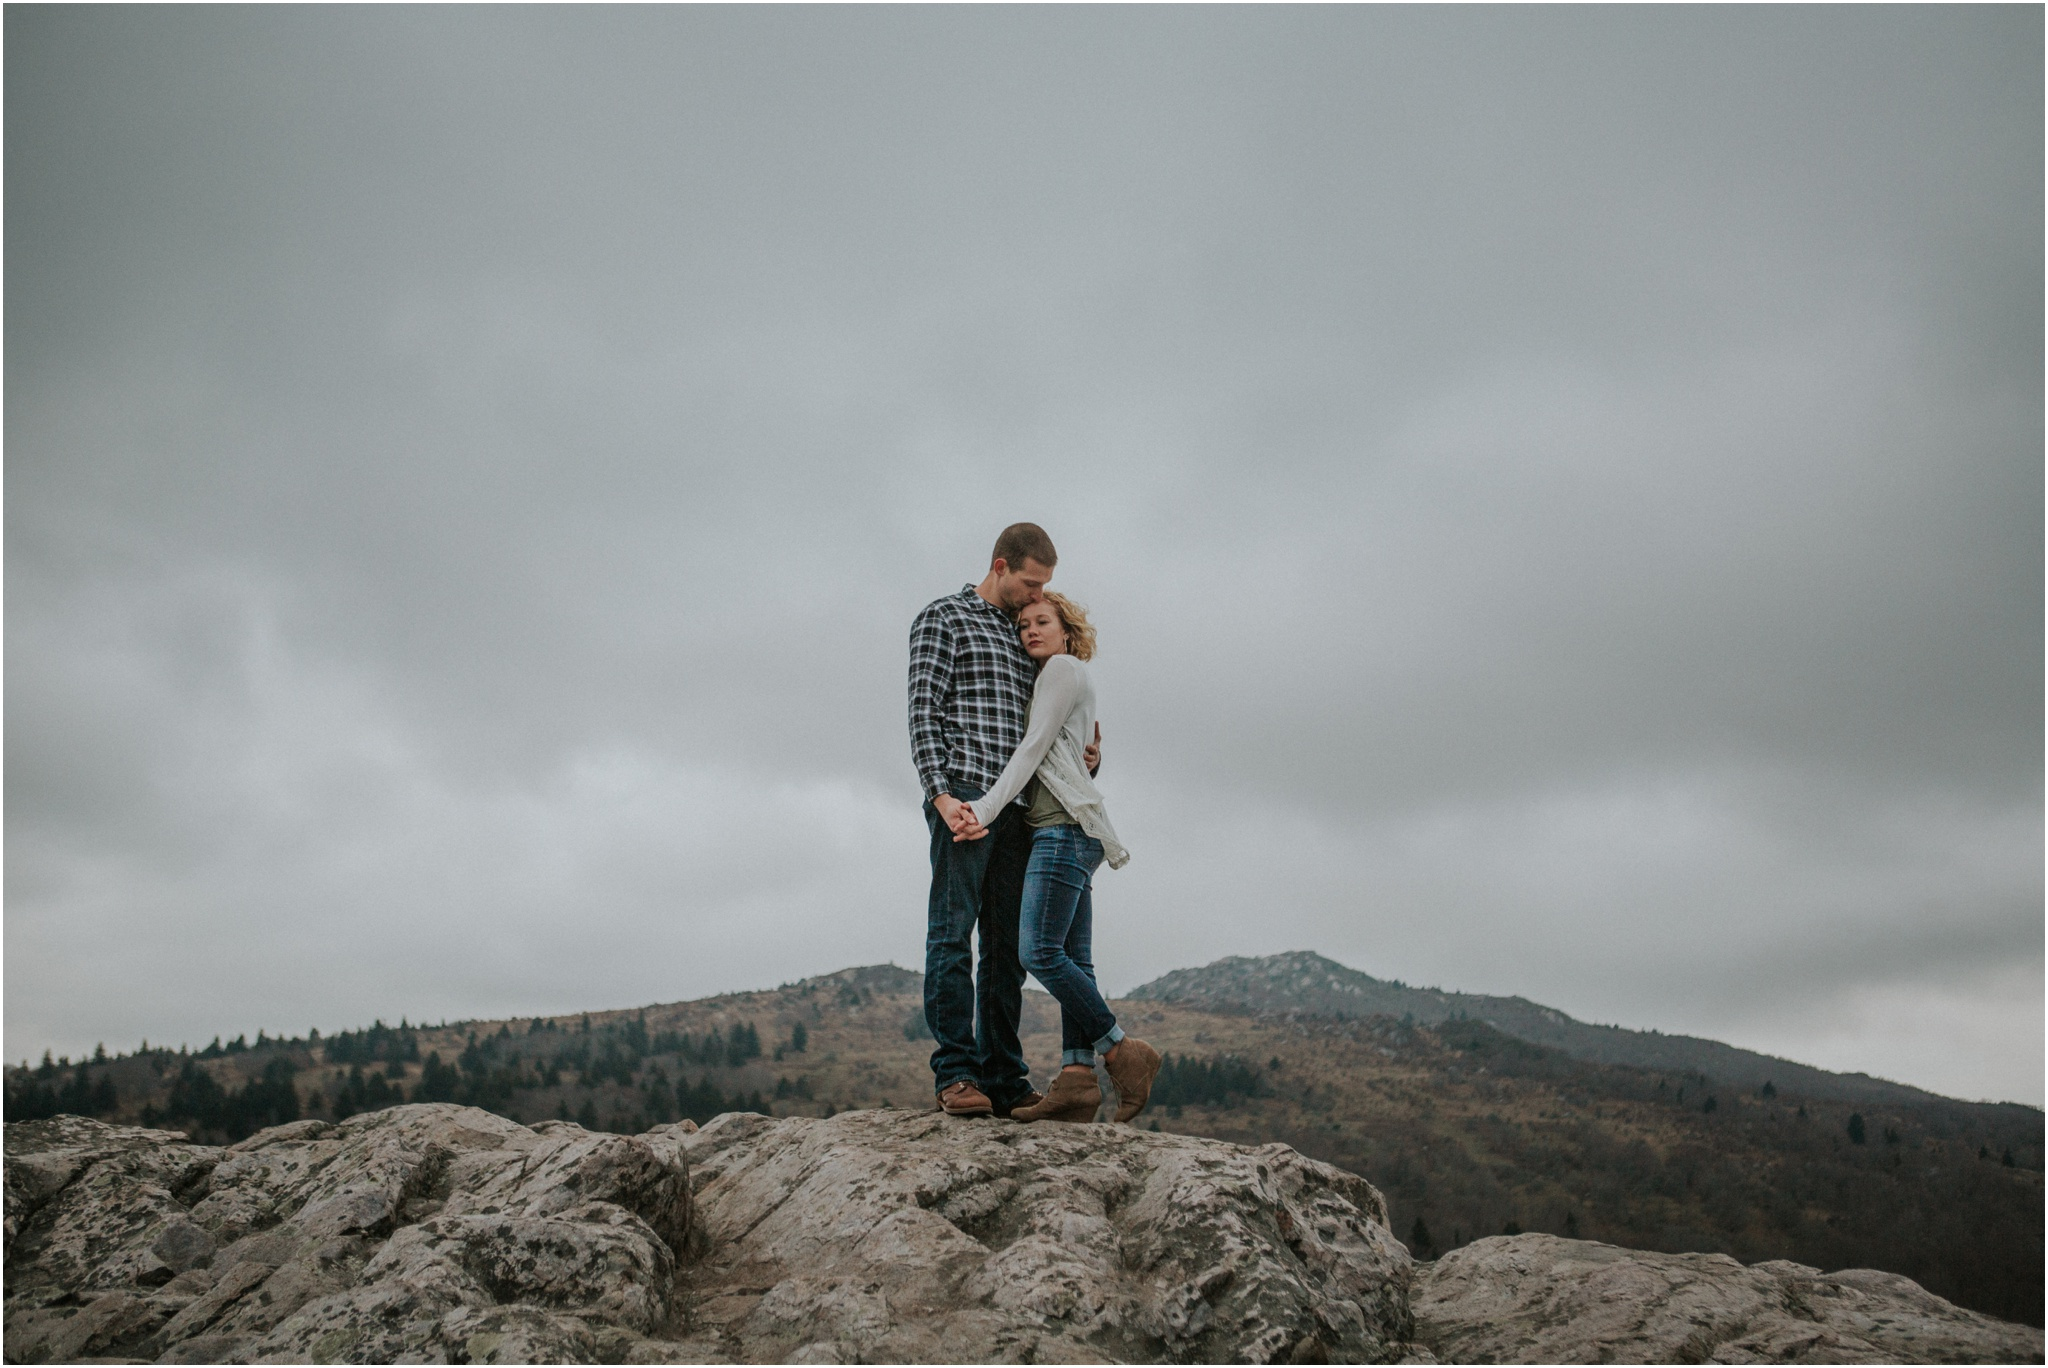 grayson-highlands-engagement-session-foggy-mountain-rustic-appalachian-virginia-katy-sergent-photography_0034.jpg